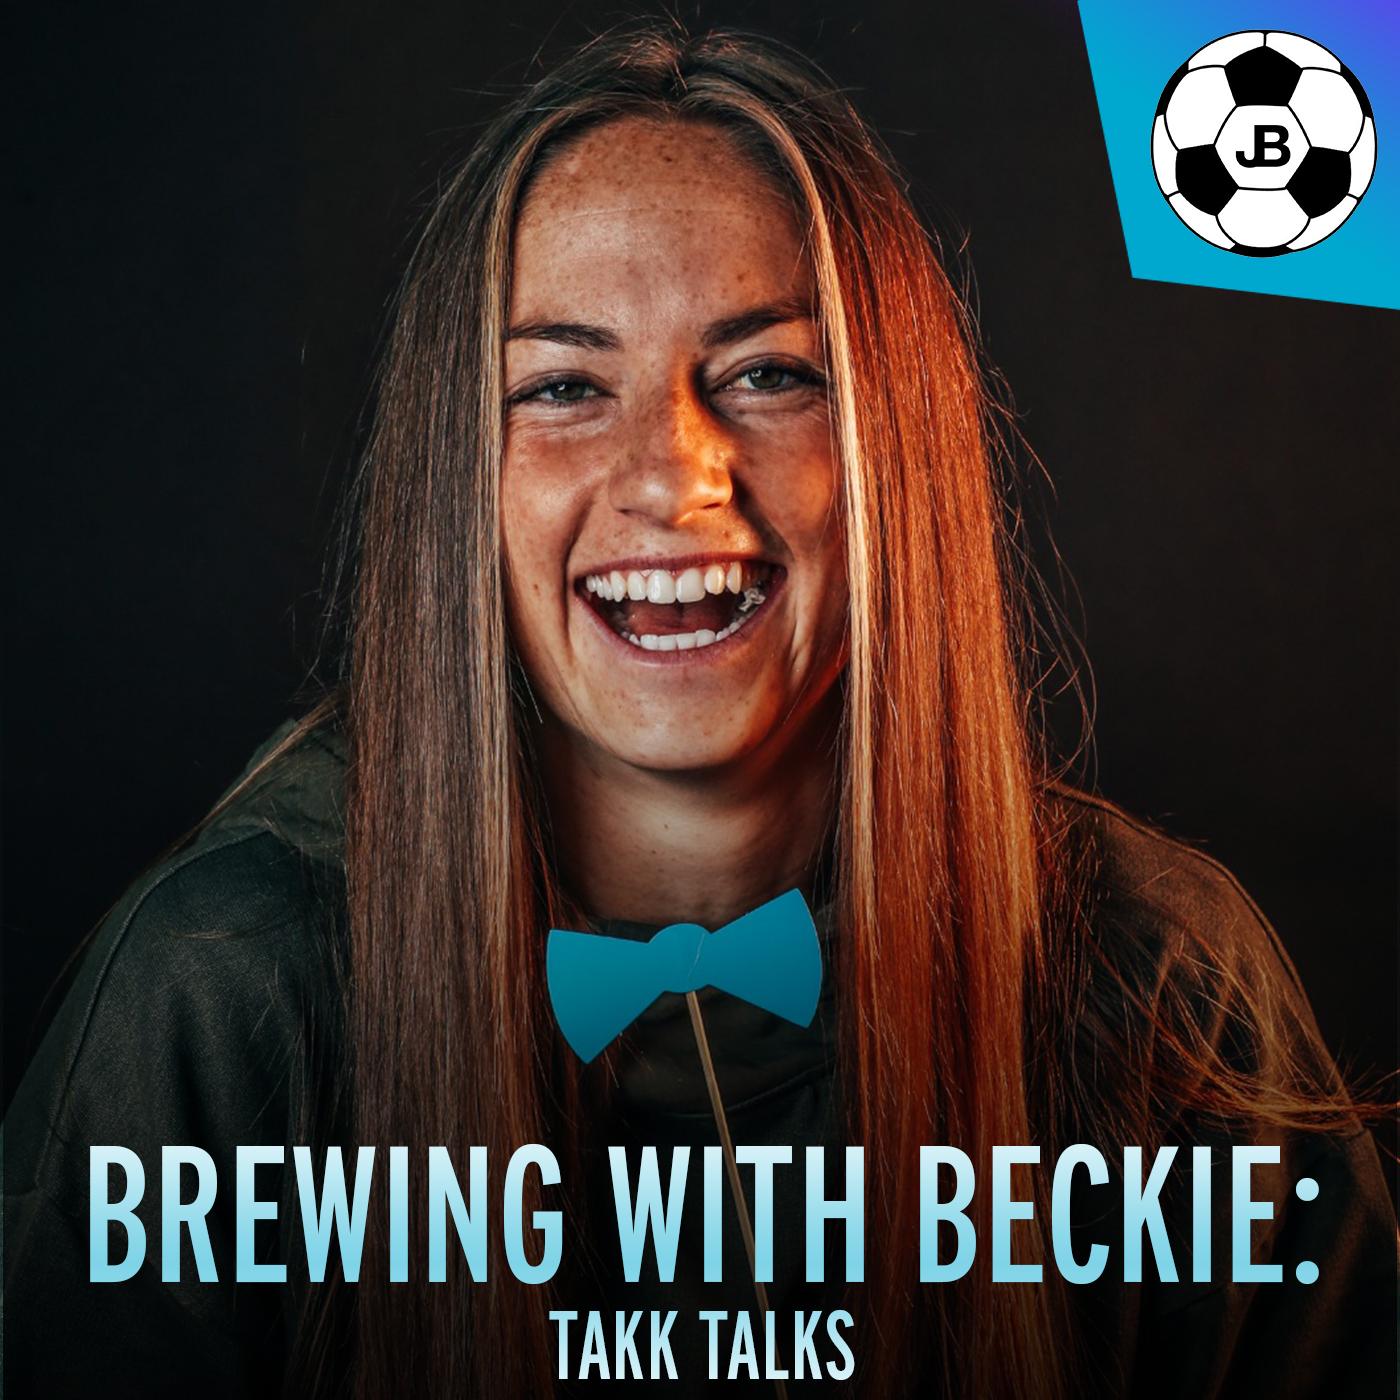 Brewing With Beckie | Takk Talks